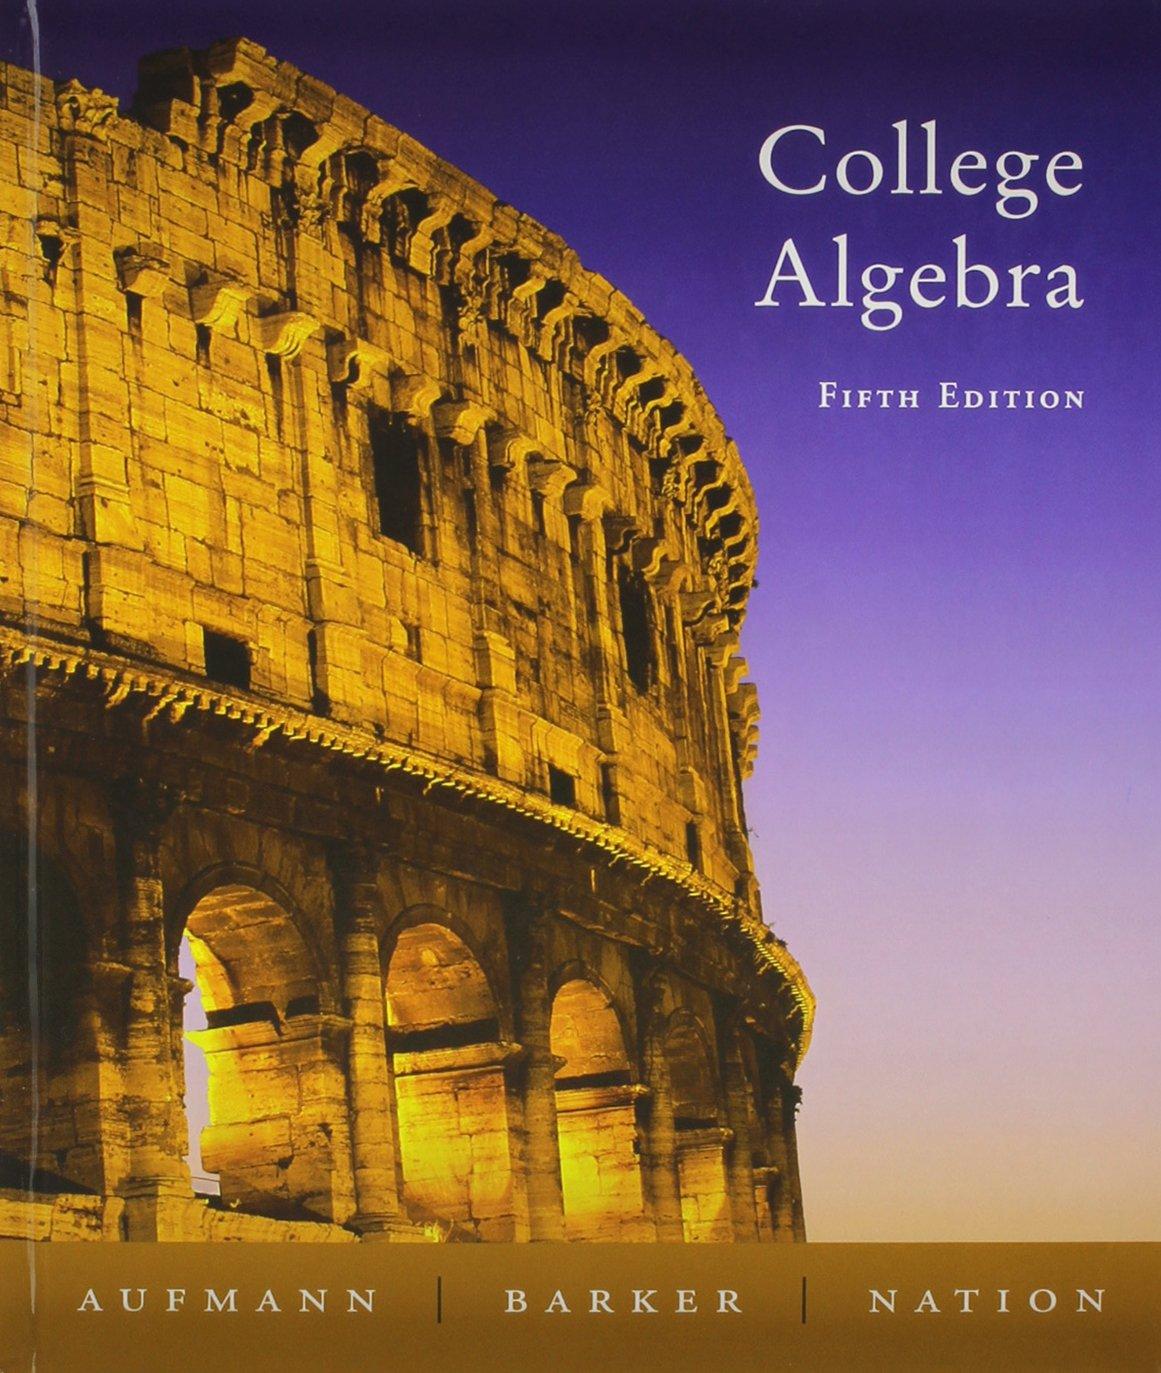 College Algebra + Study Guide 5th Ed + Smarthinking pdf